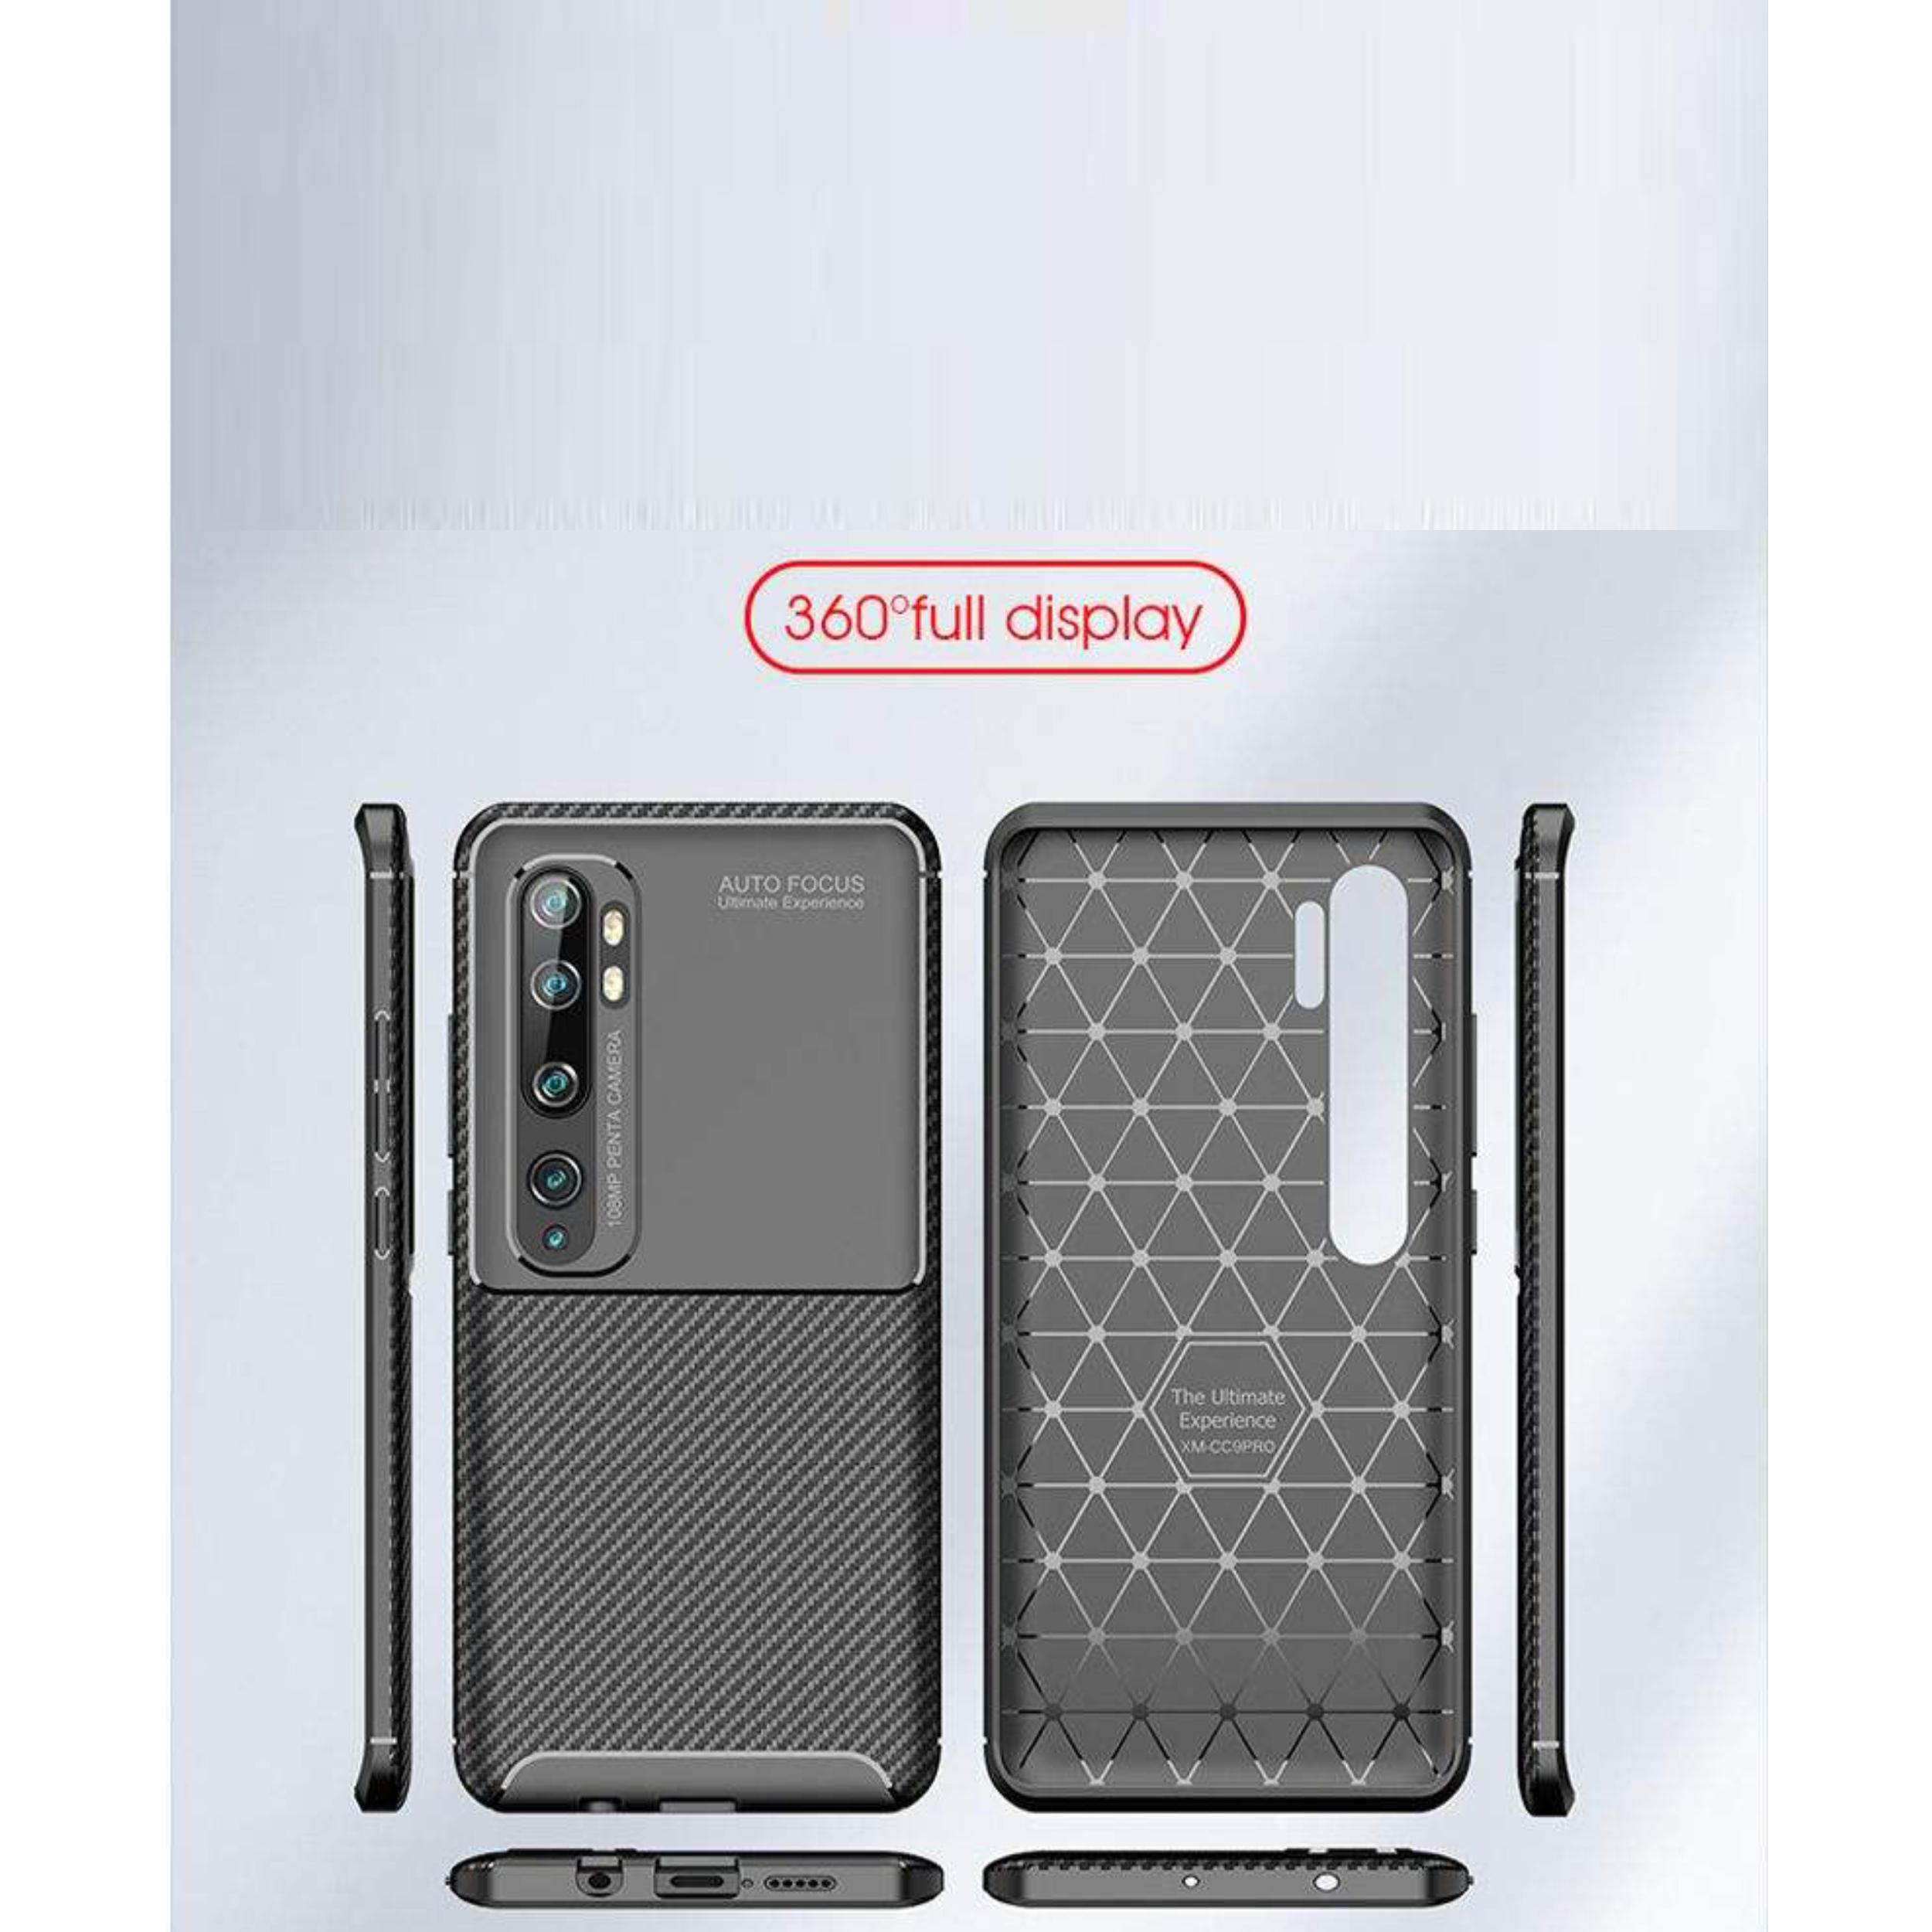 کاور لاین کینگ مدل A21 مناسب برای گوشی موبایل شیائومی Mi Note 10/Note 10 Pro/CC9 Pro thumb 2 10